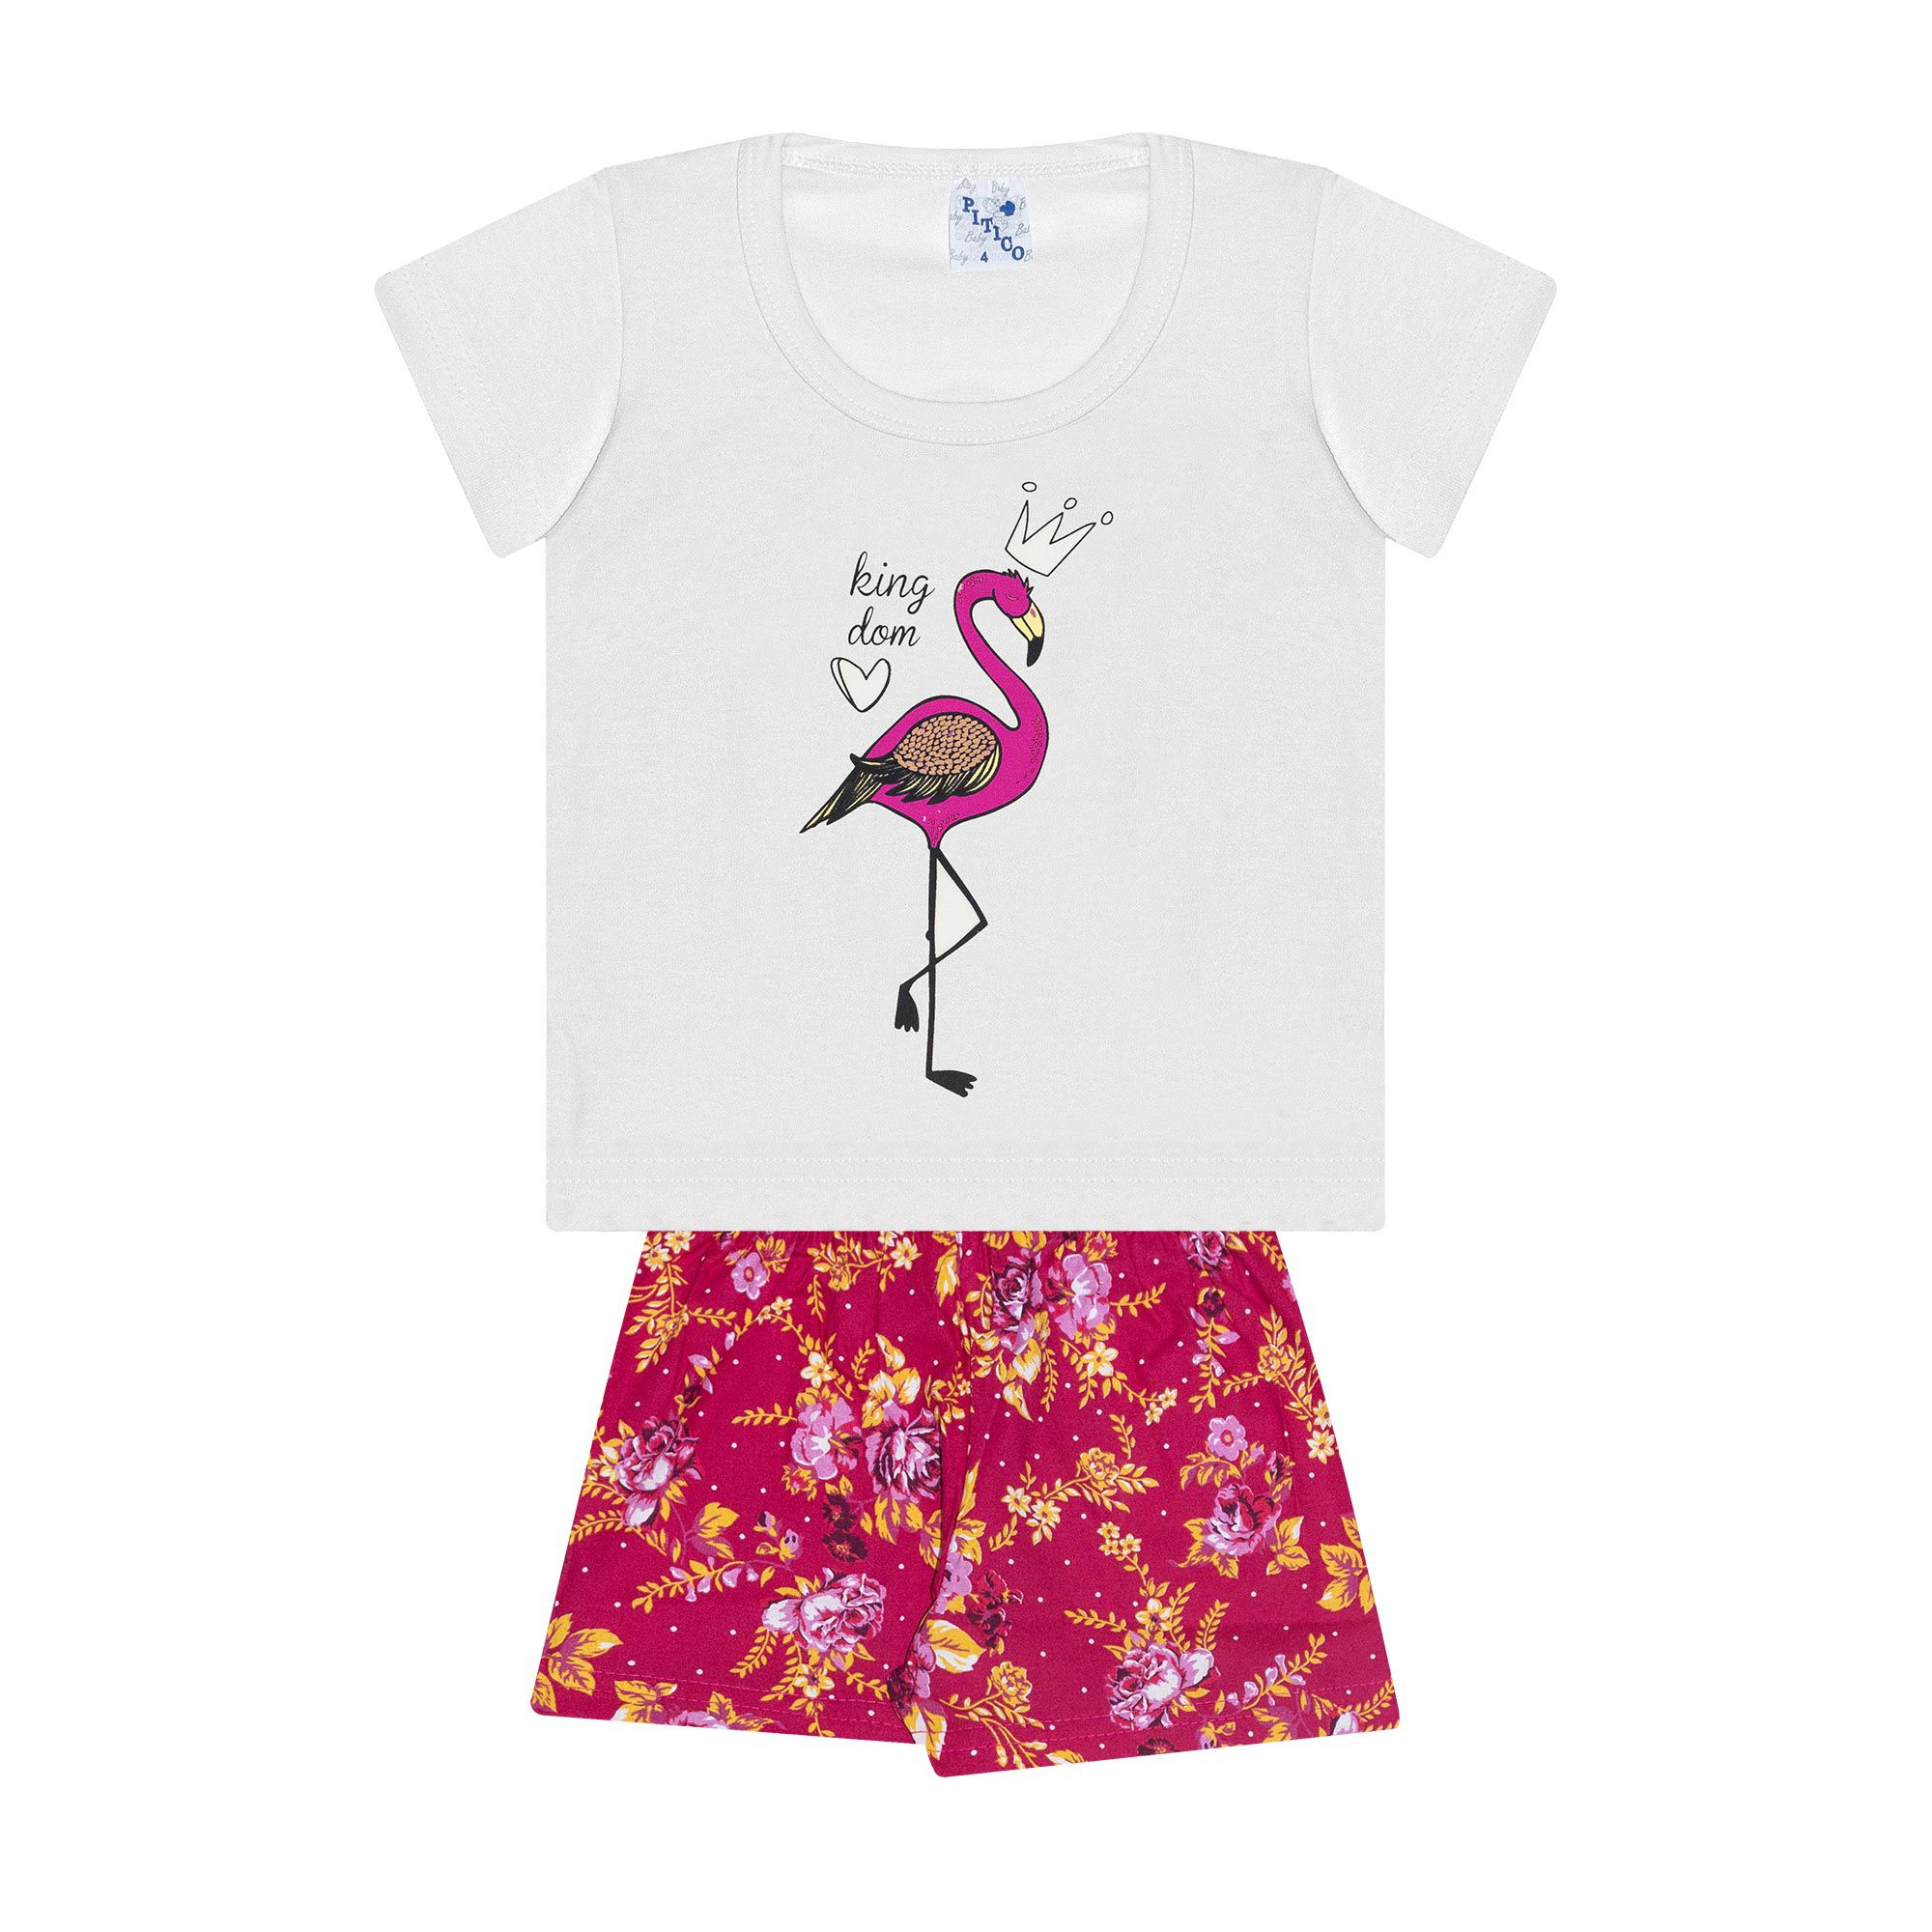 Conjunto Infantil Feminino - Ref 1025 - Branco/Pink - Pitico